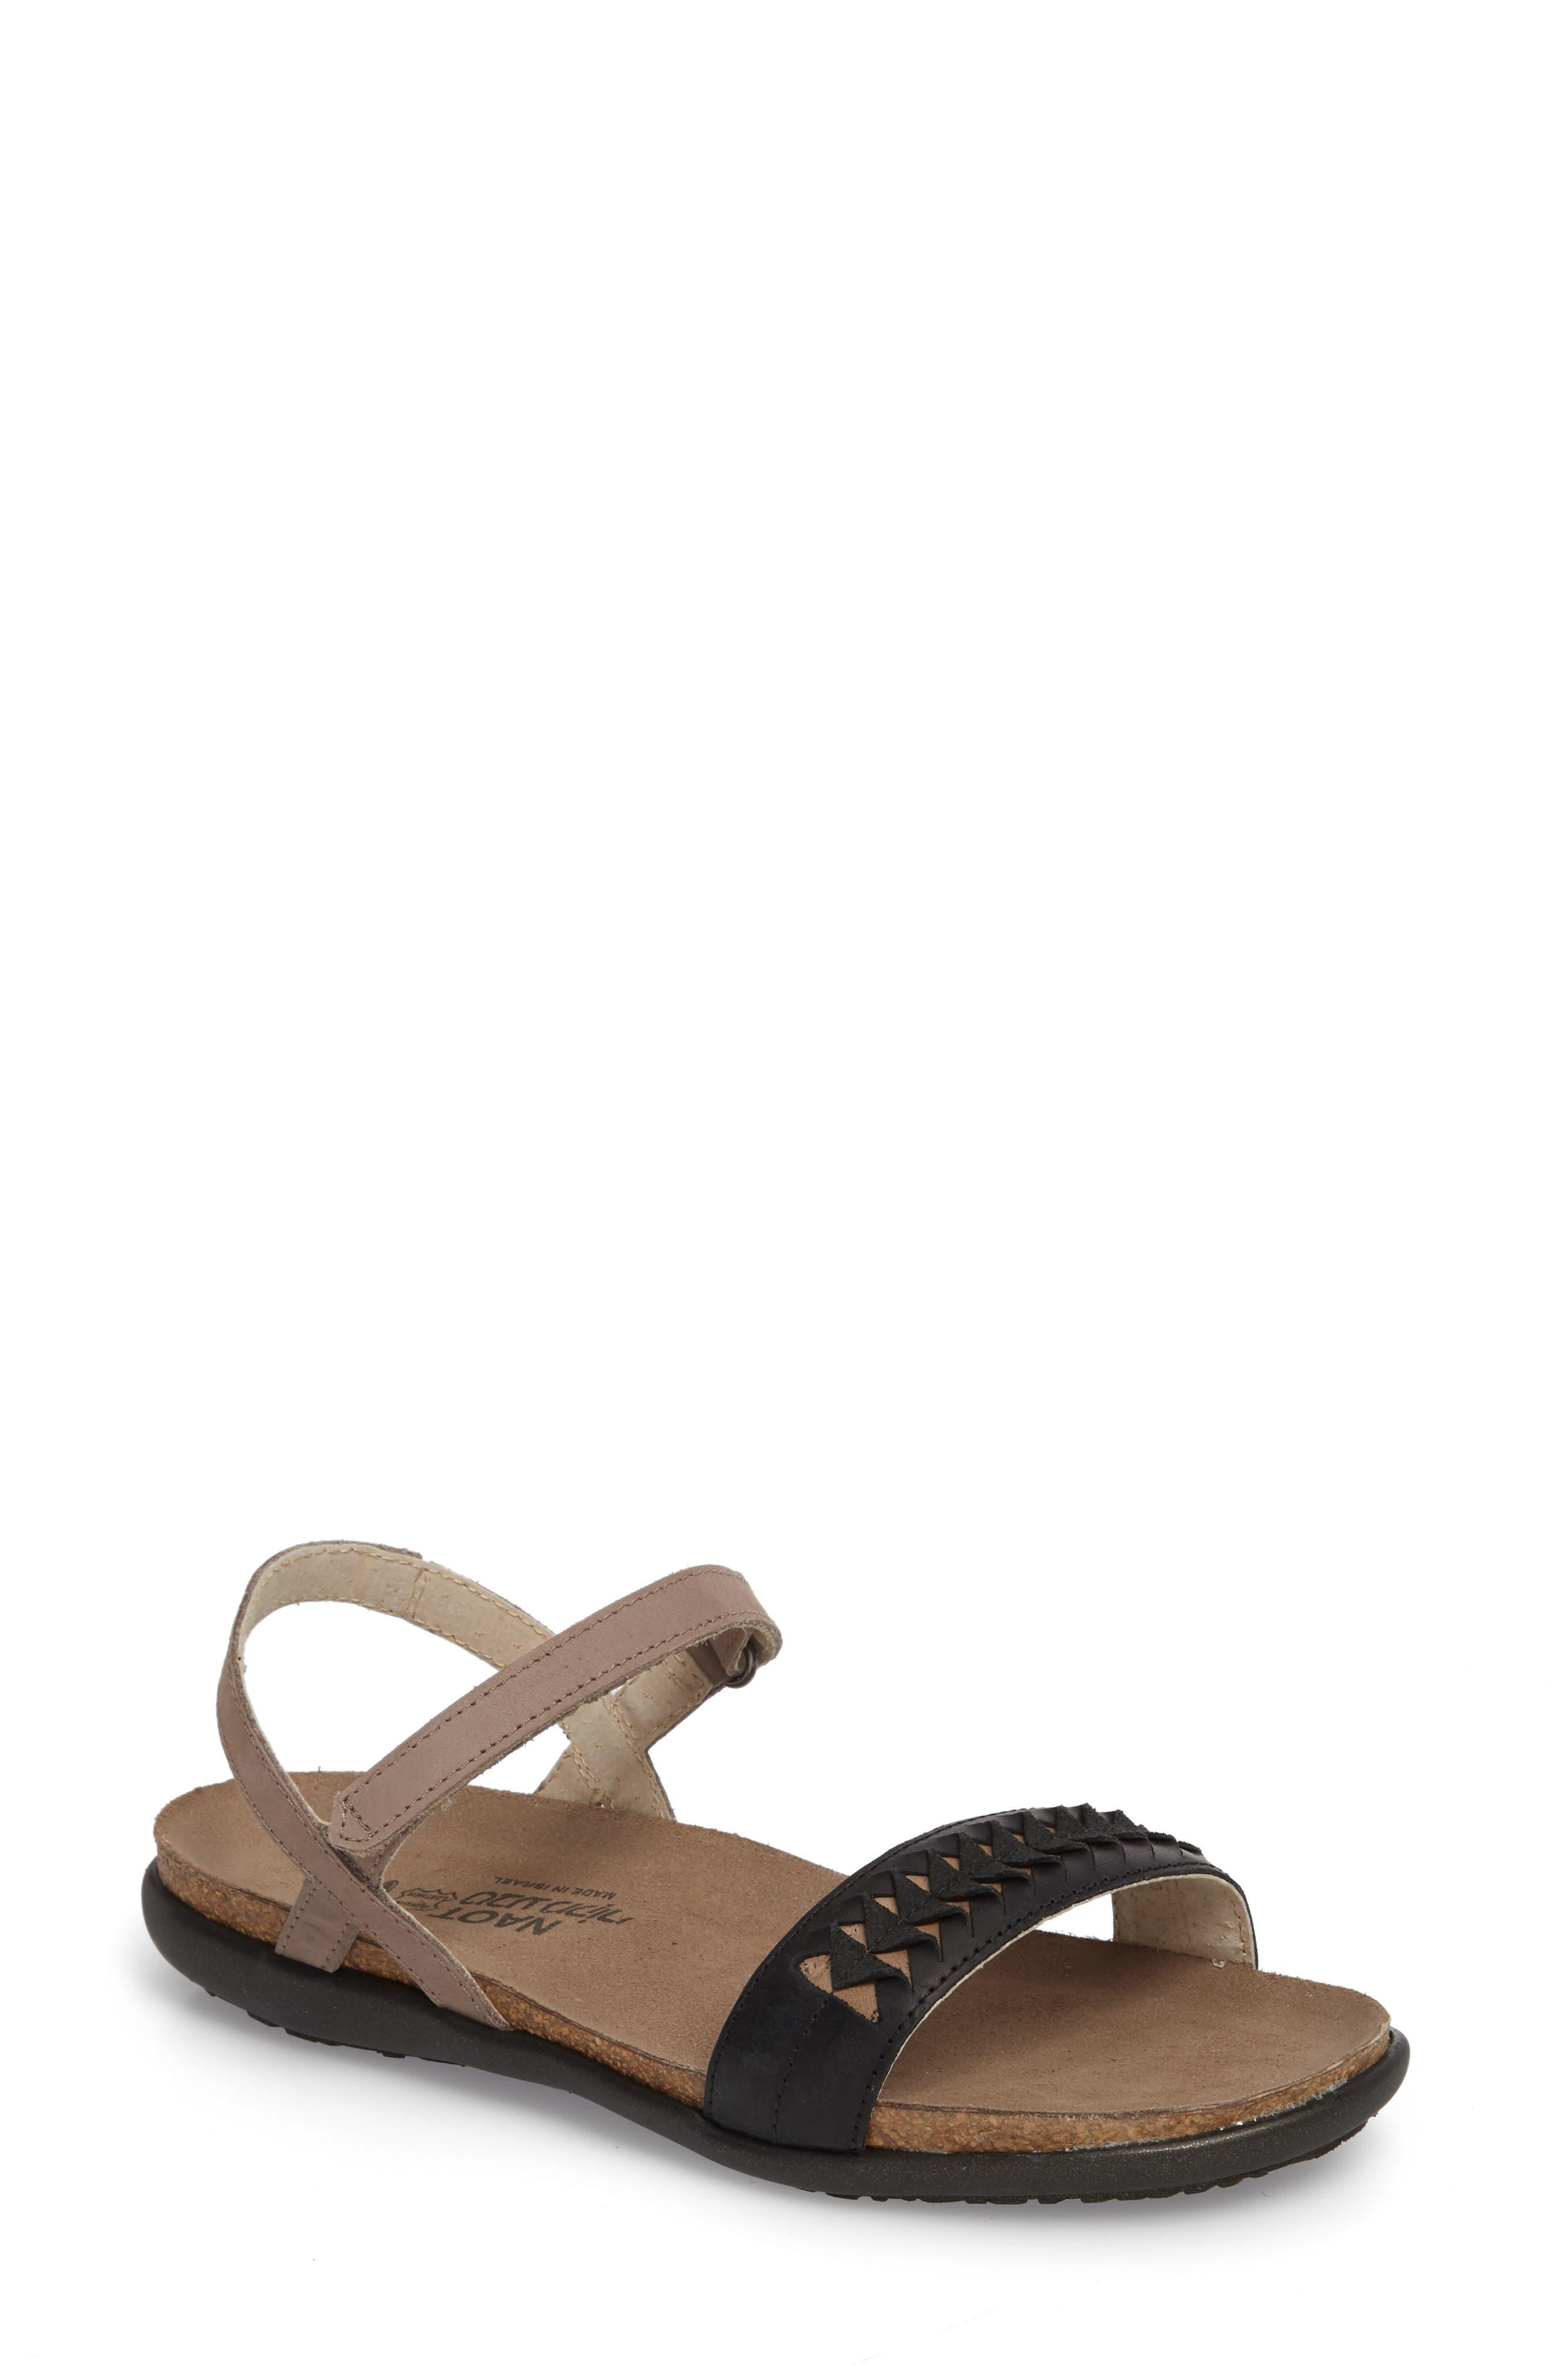 Marble Sandal,                         Main,                         color, STONE NUBUCK